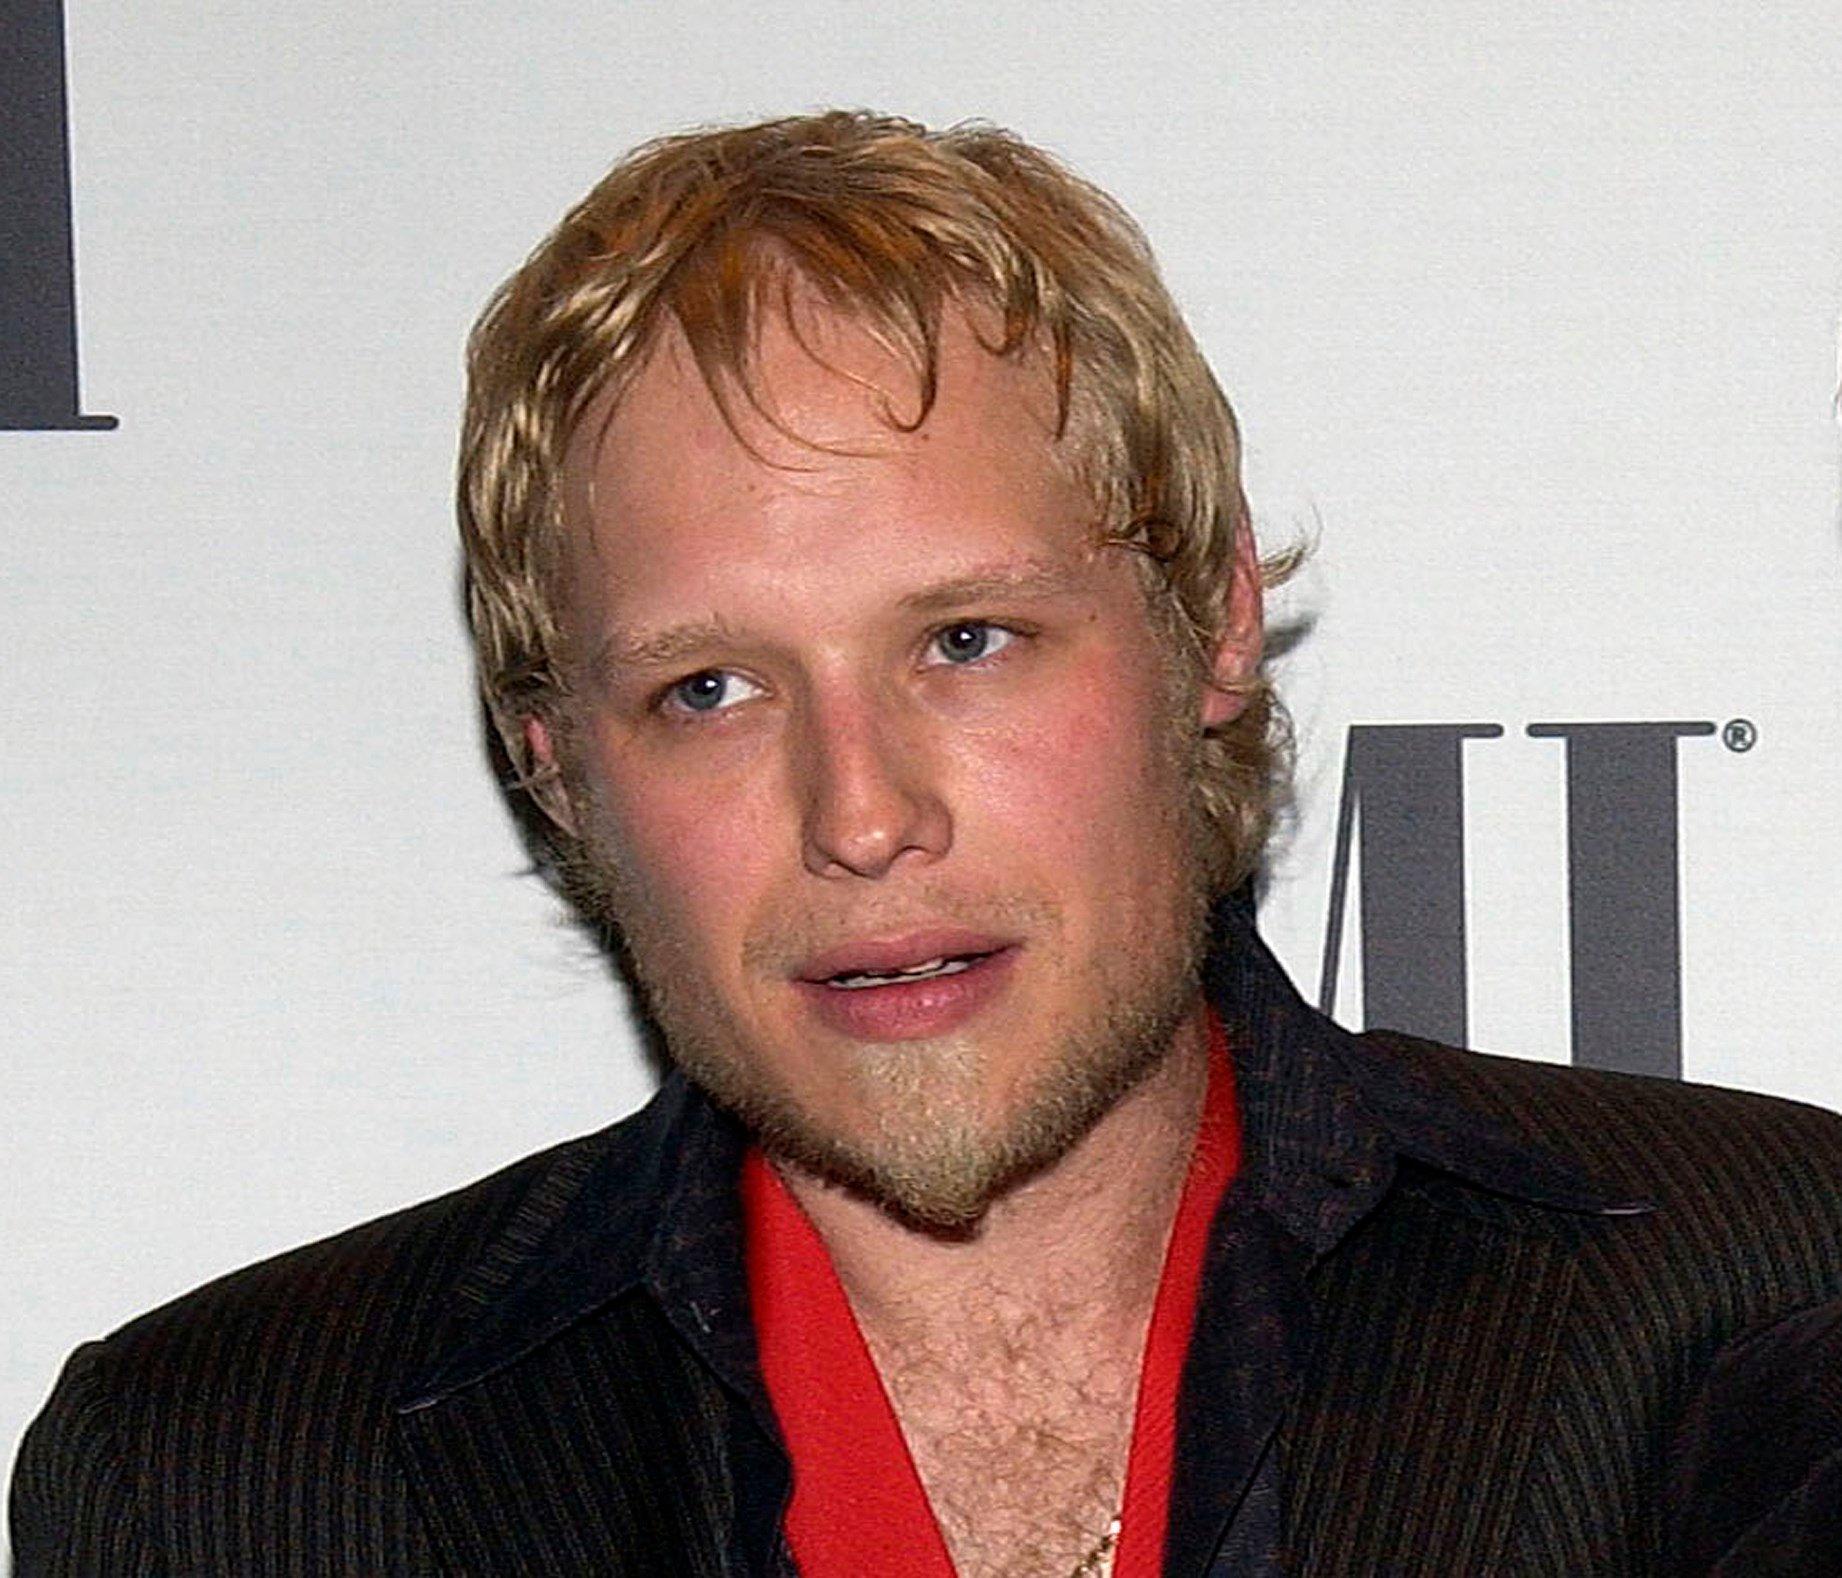 In this May 17, 2005, file photo, 3 Doors Down member Matt Roberts arrives at the BMI Pop Music Awards in Beverly Hills, Calif. (AP Photo/Matt Sayles, File)